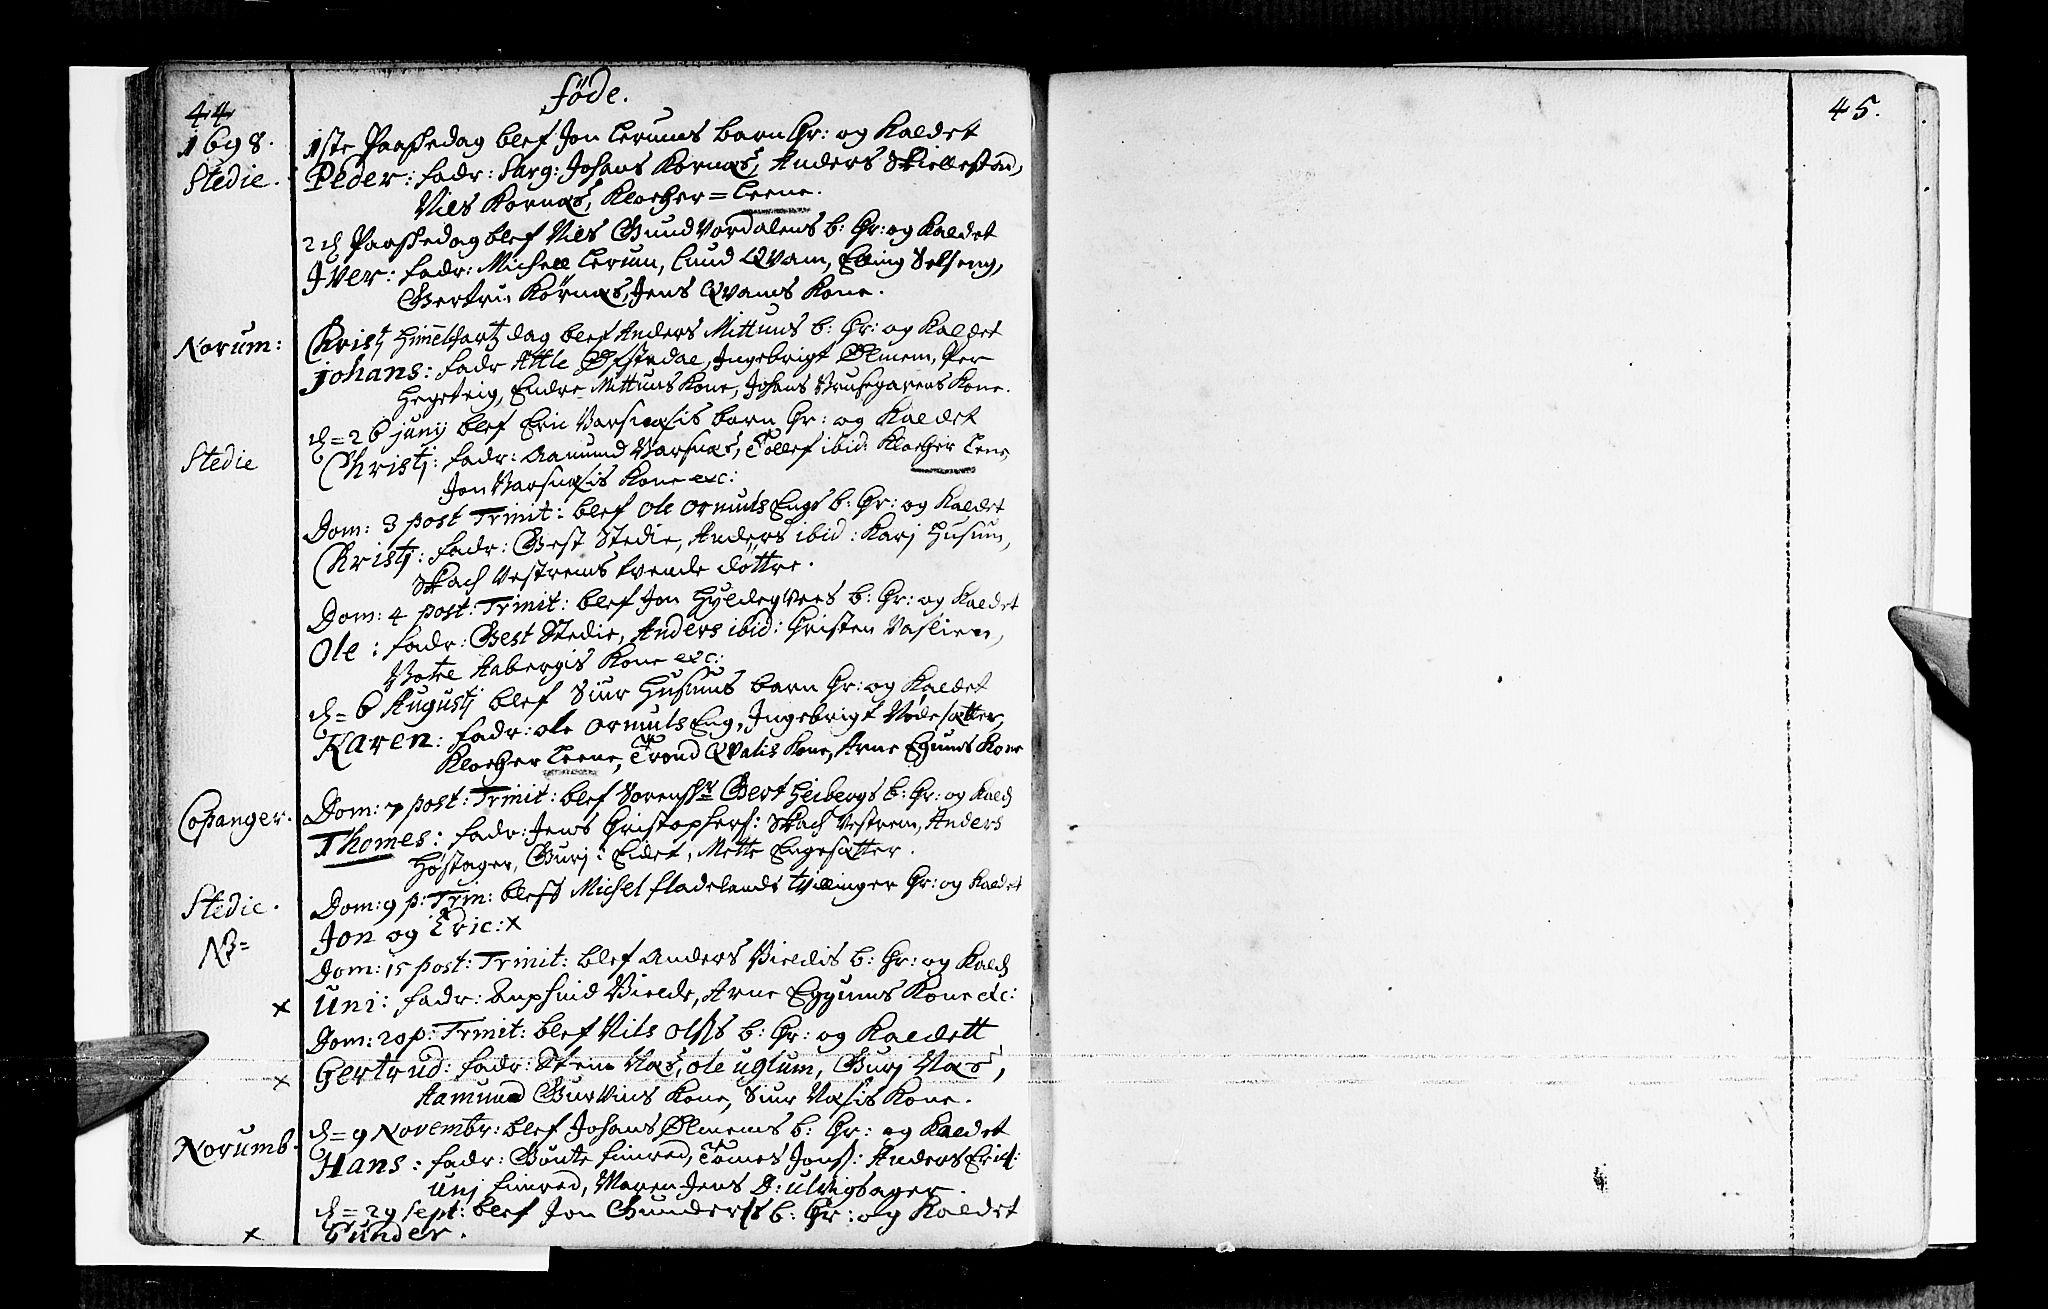 SAB, Sogndal sokneprestembete, H/Haa/Haaa/L0001: Ministerialbok nr. A 1, 1689-1713, s. 44-45